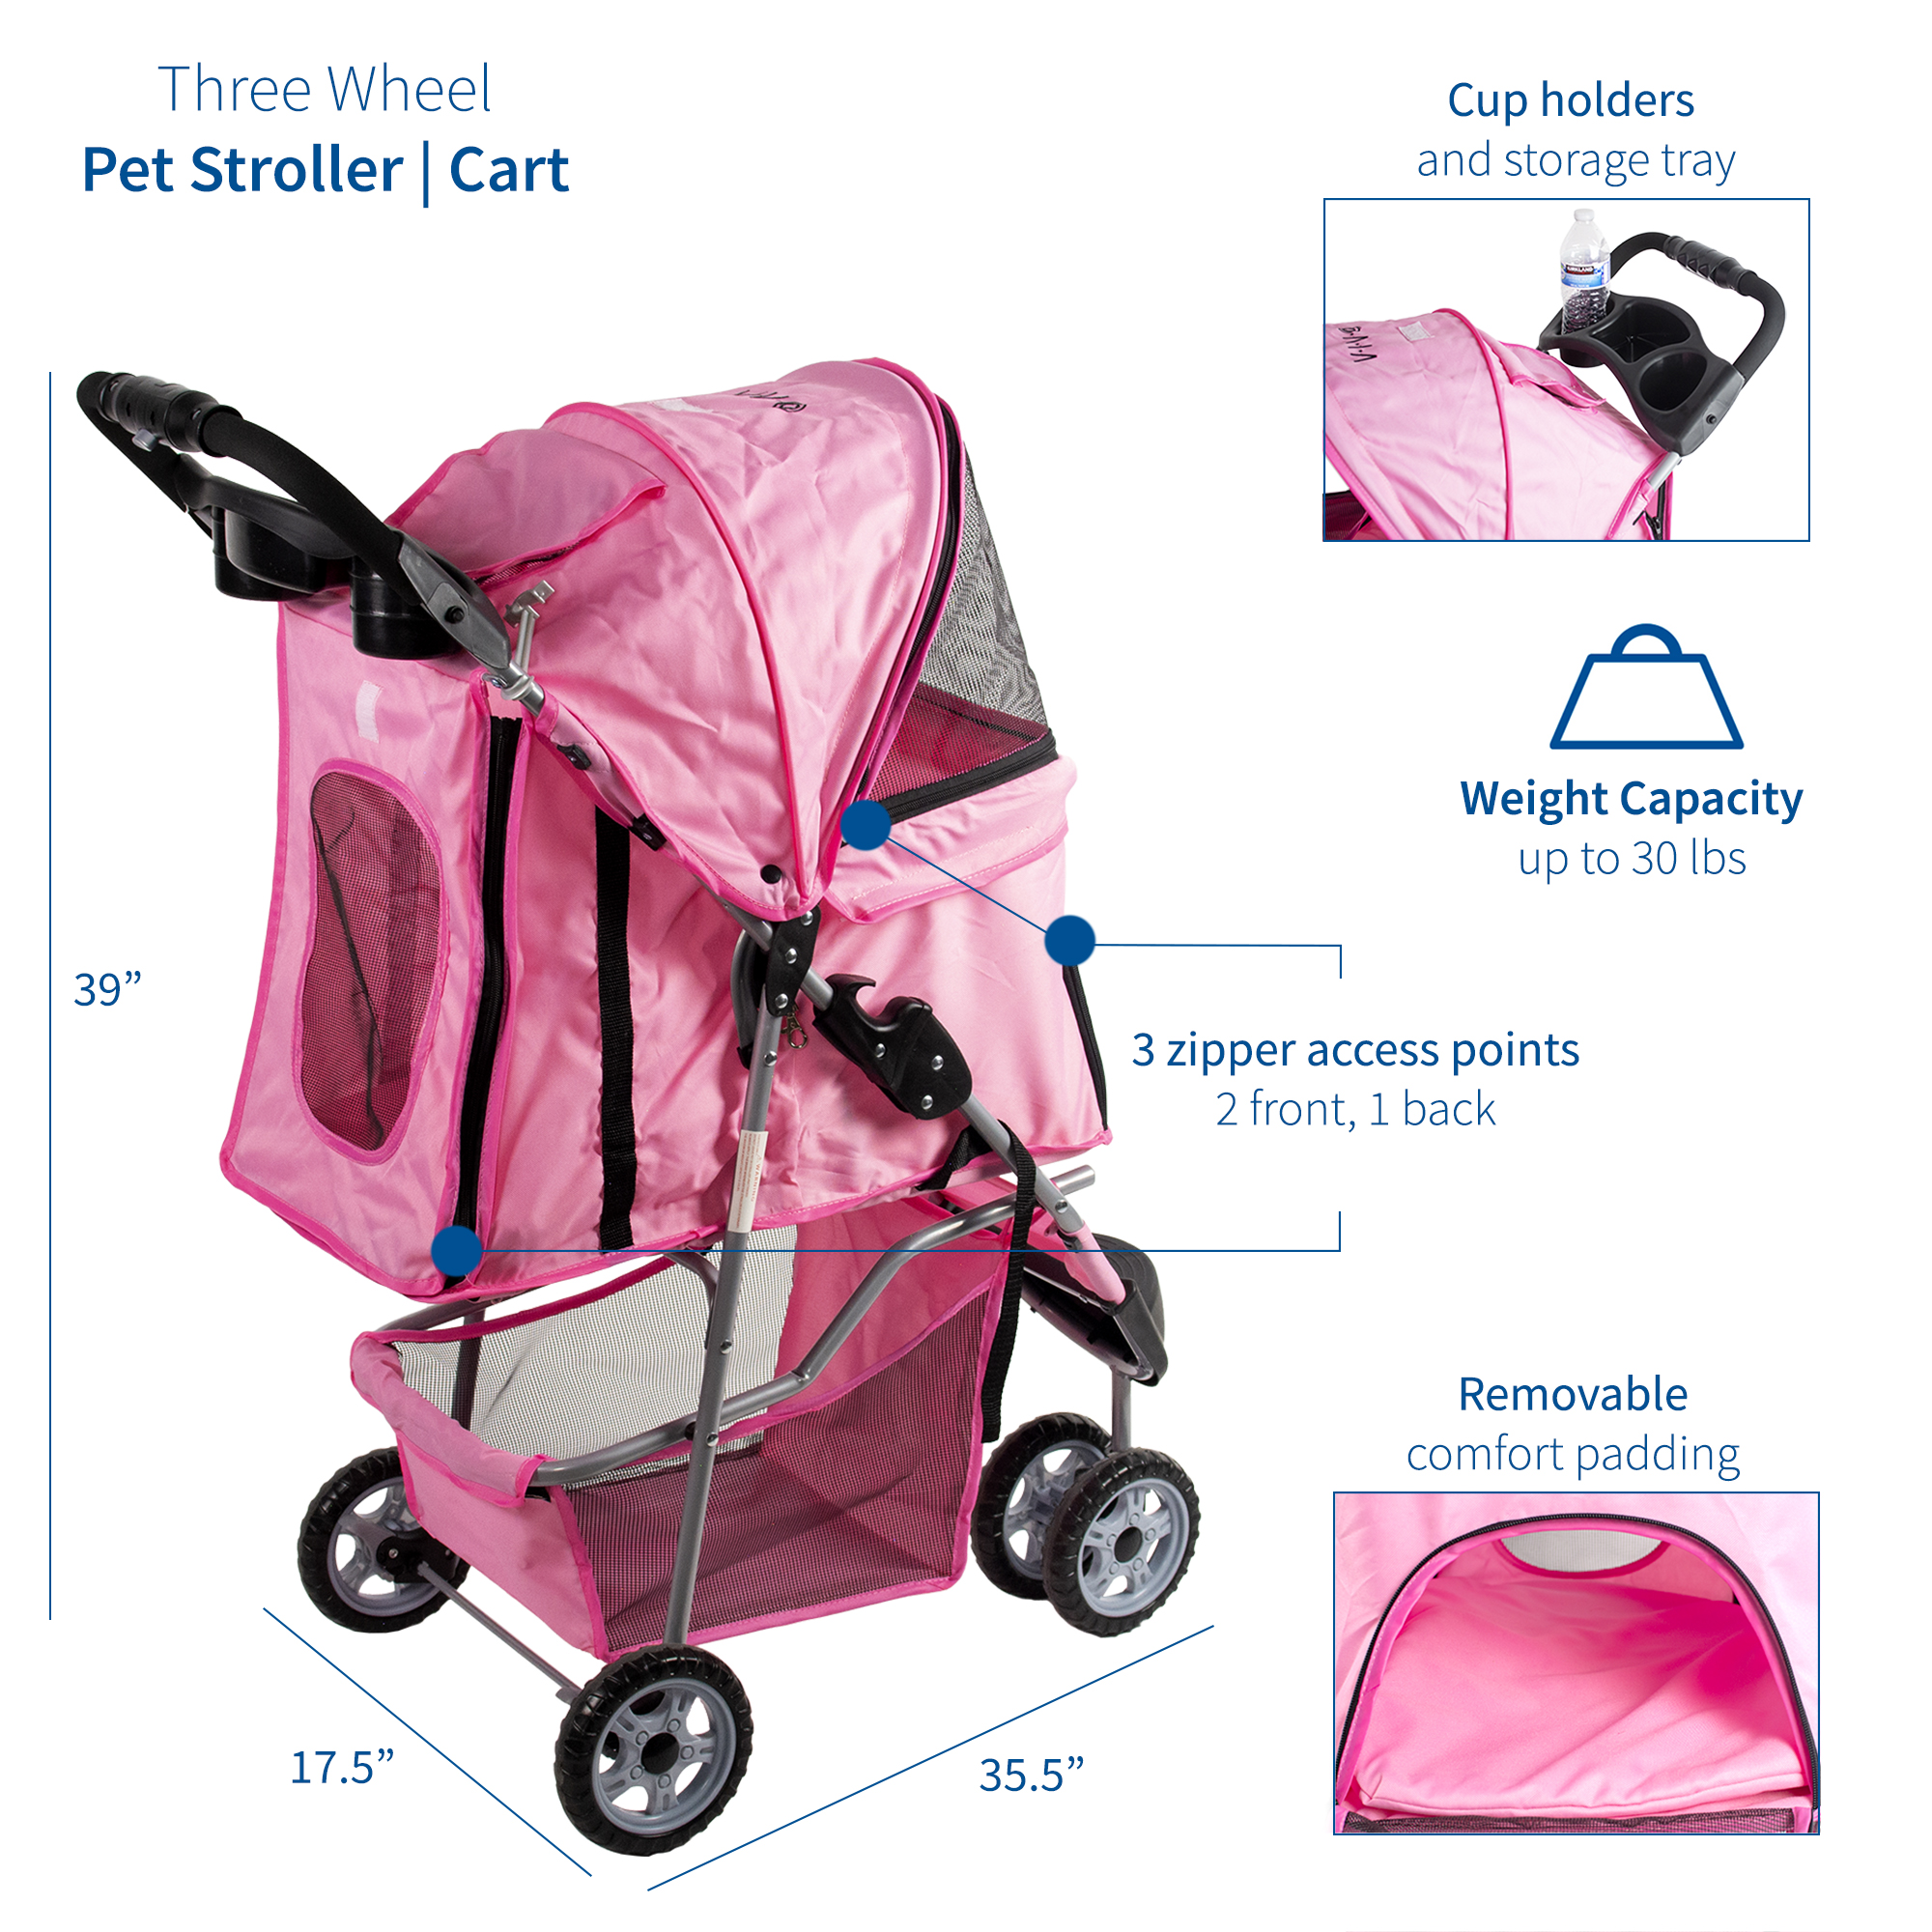 thumbnail 14 - VIVO Three Wheel Pet Stroller / Cat & Dog Foldable Carrier Strolling Cart